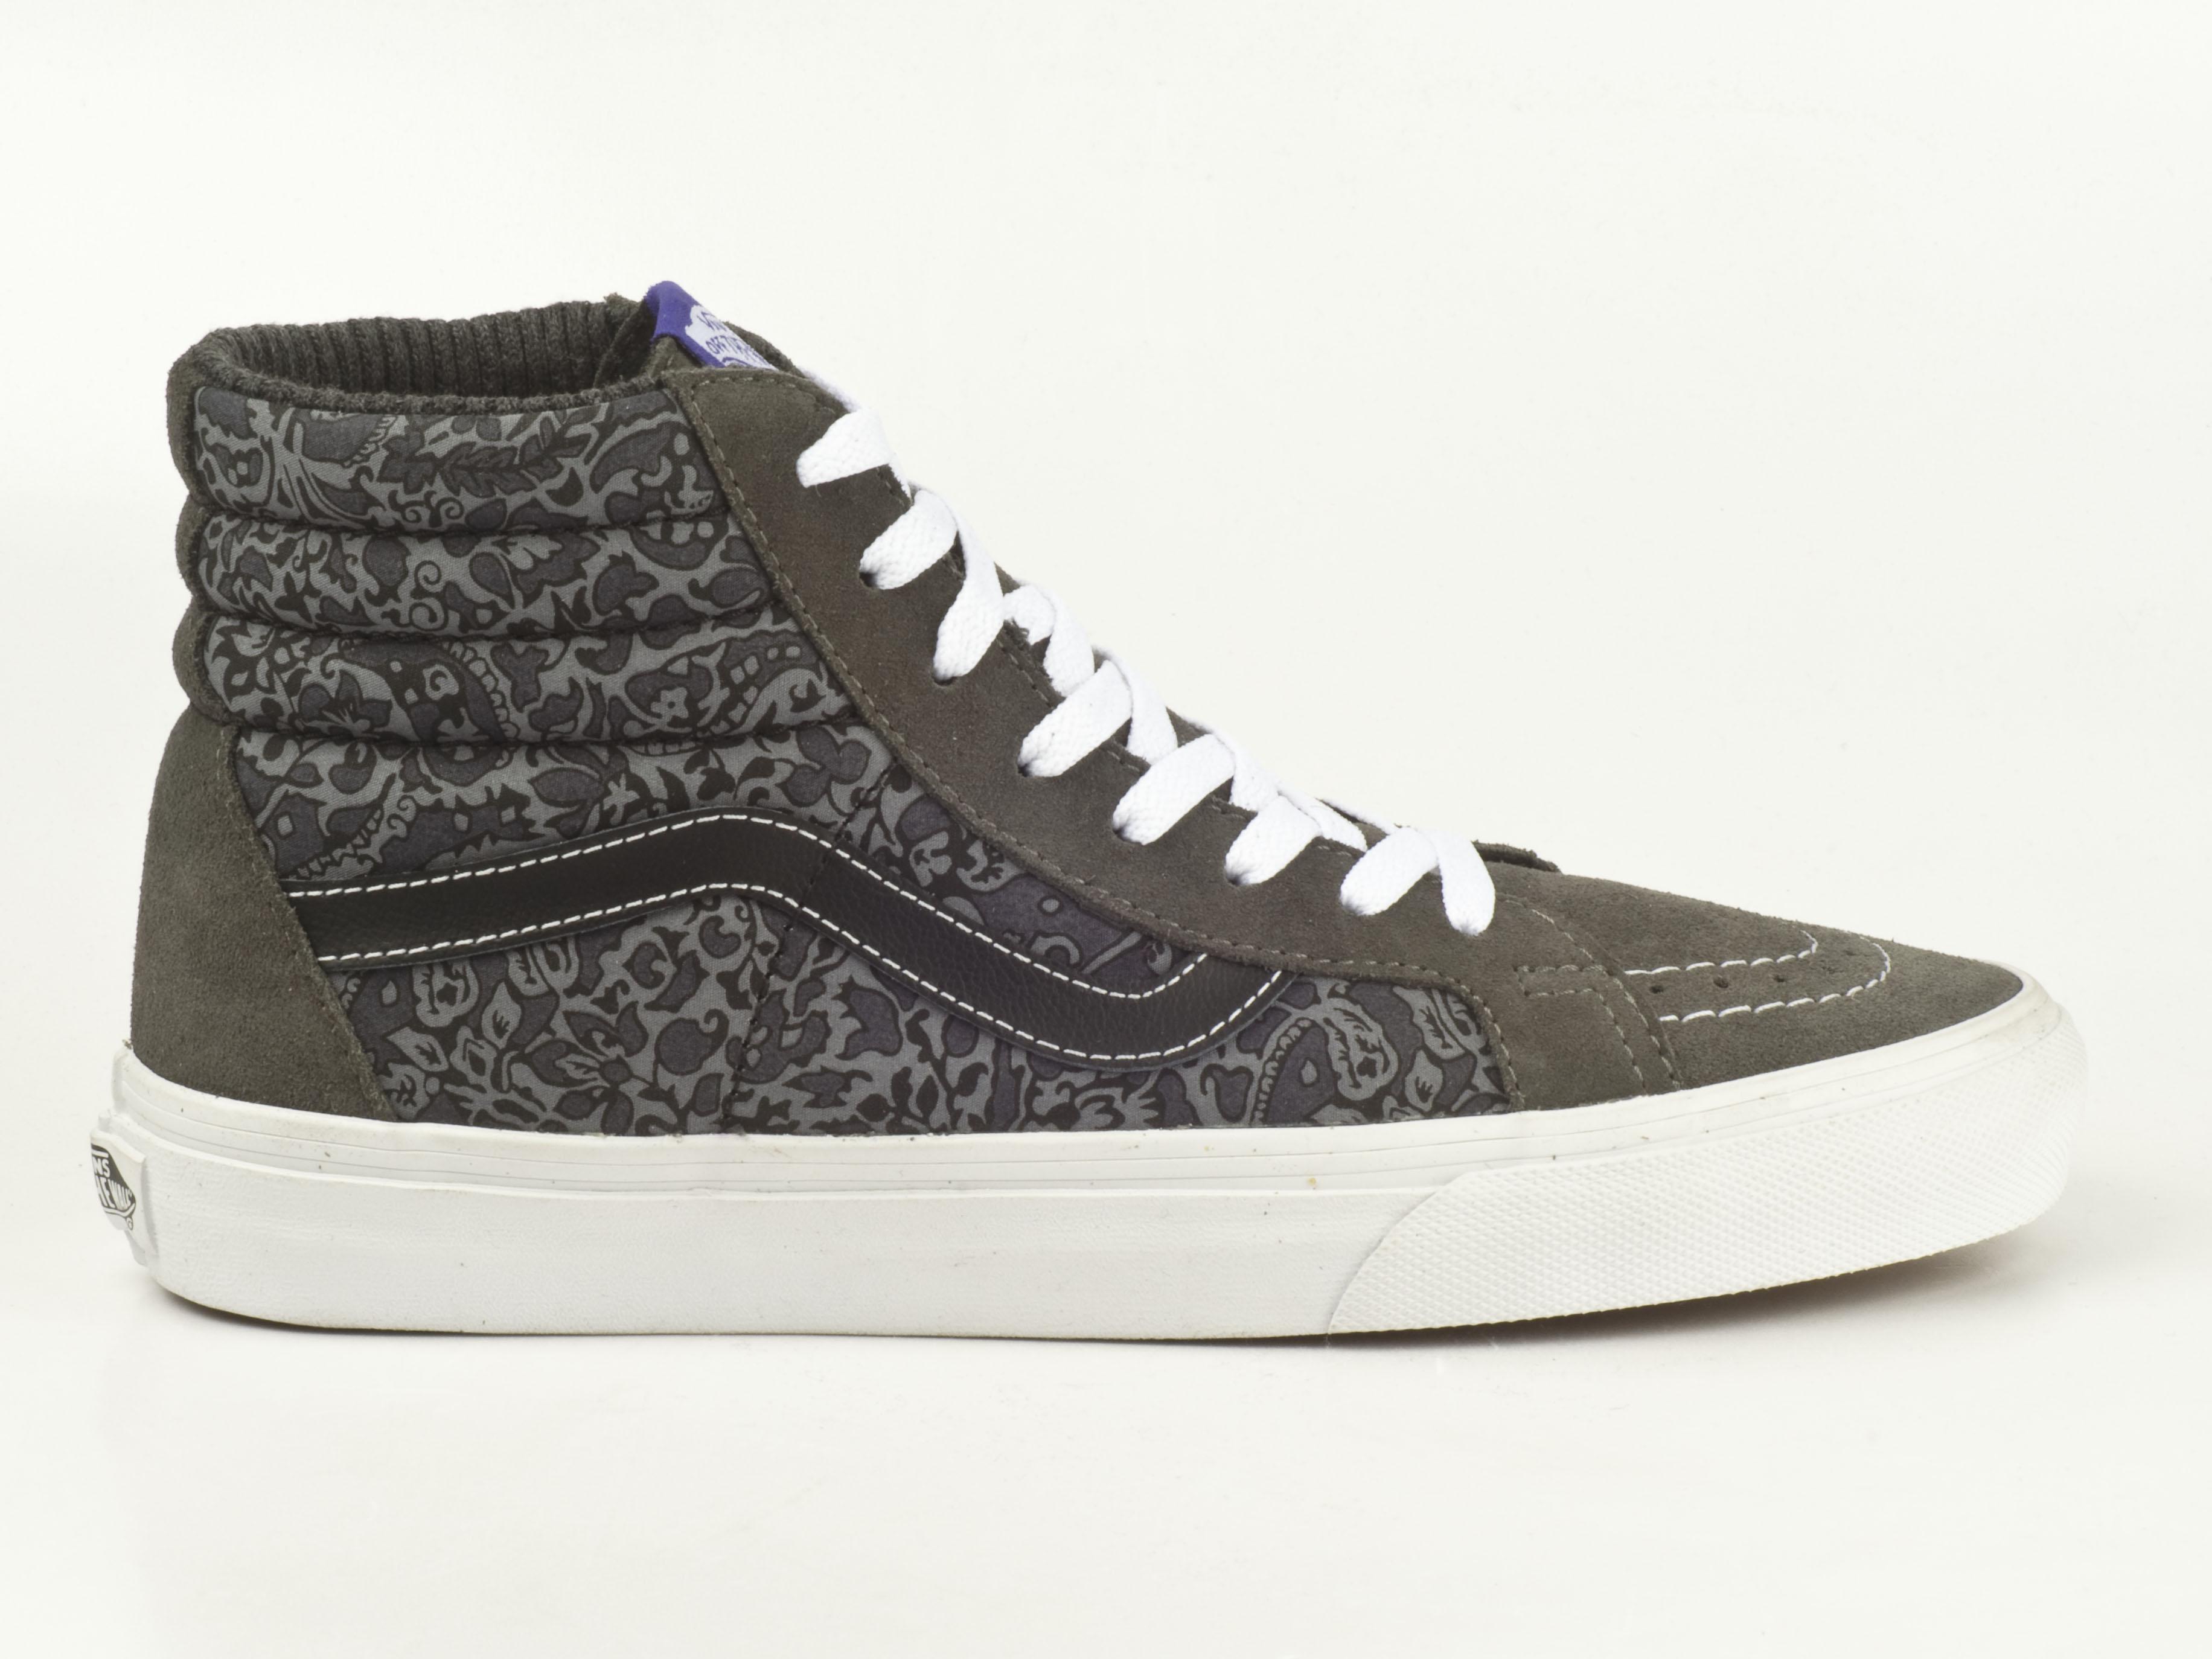 vans schuhe sneaker sk8 hi reissue vza0euh skater grey grau wei paisley leder. Black Bedroom Furniture Sets. Home Design Ideas